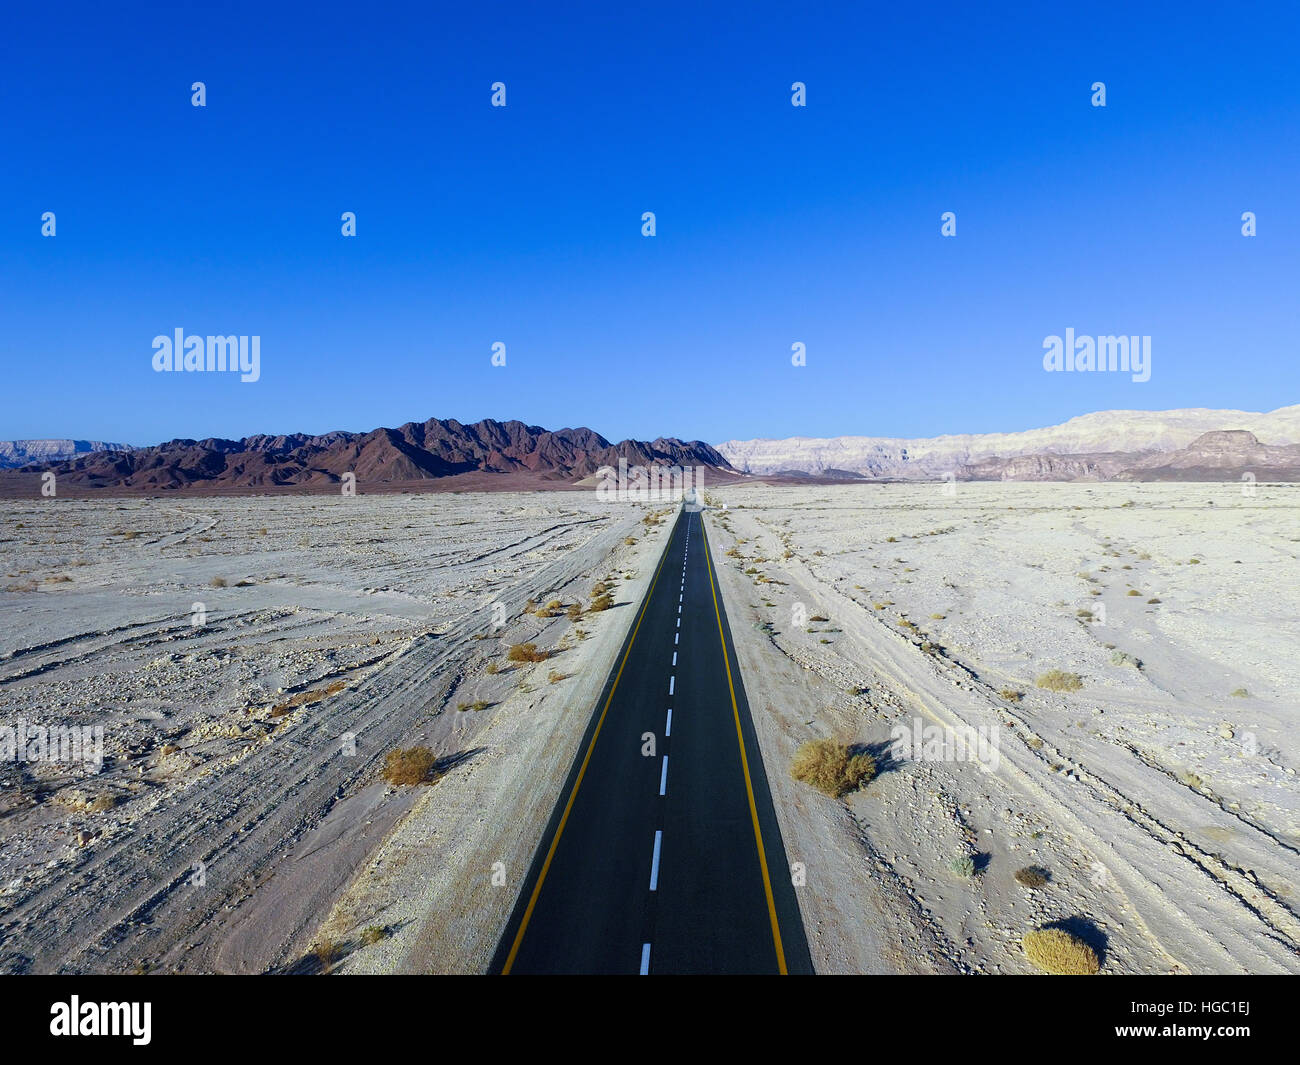 Empty desert road - Aerial image - Stock Image